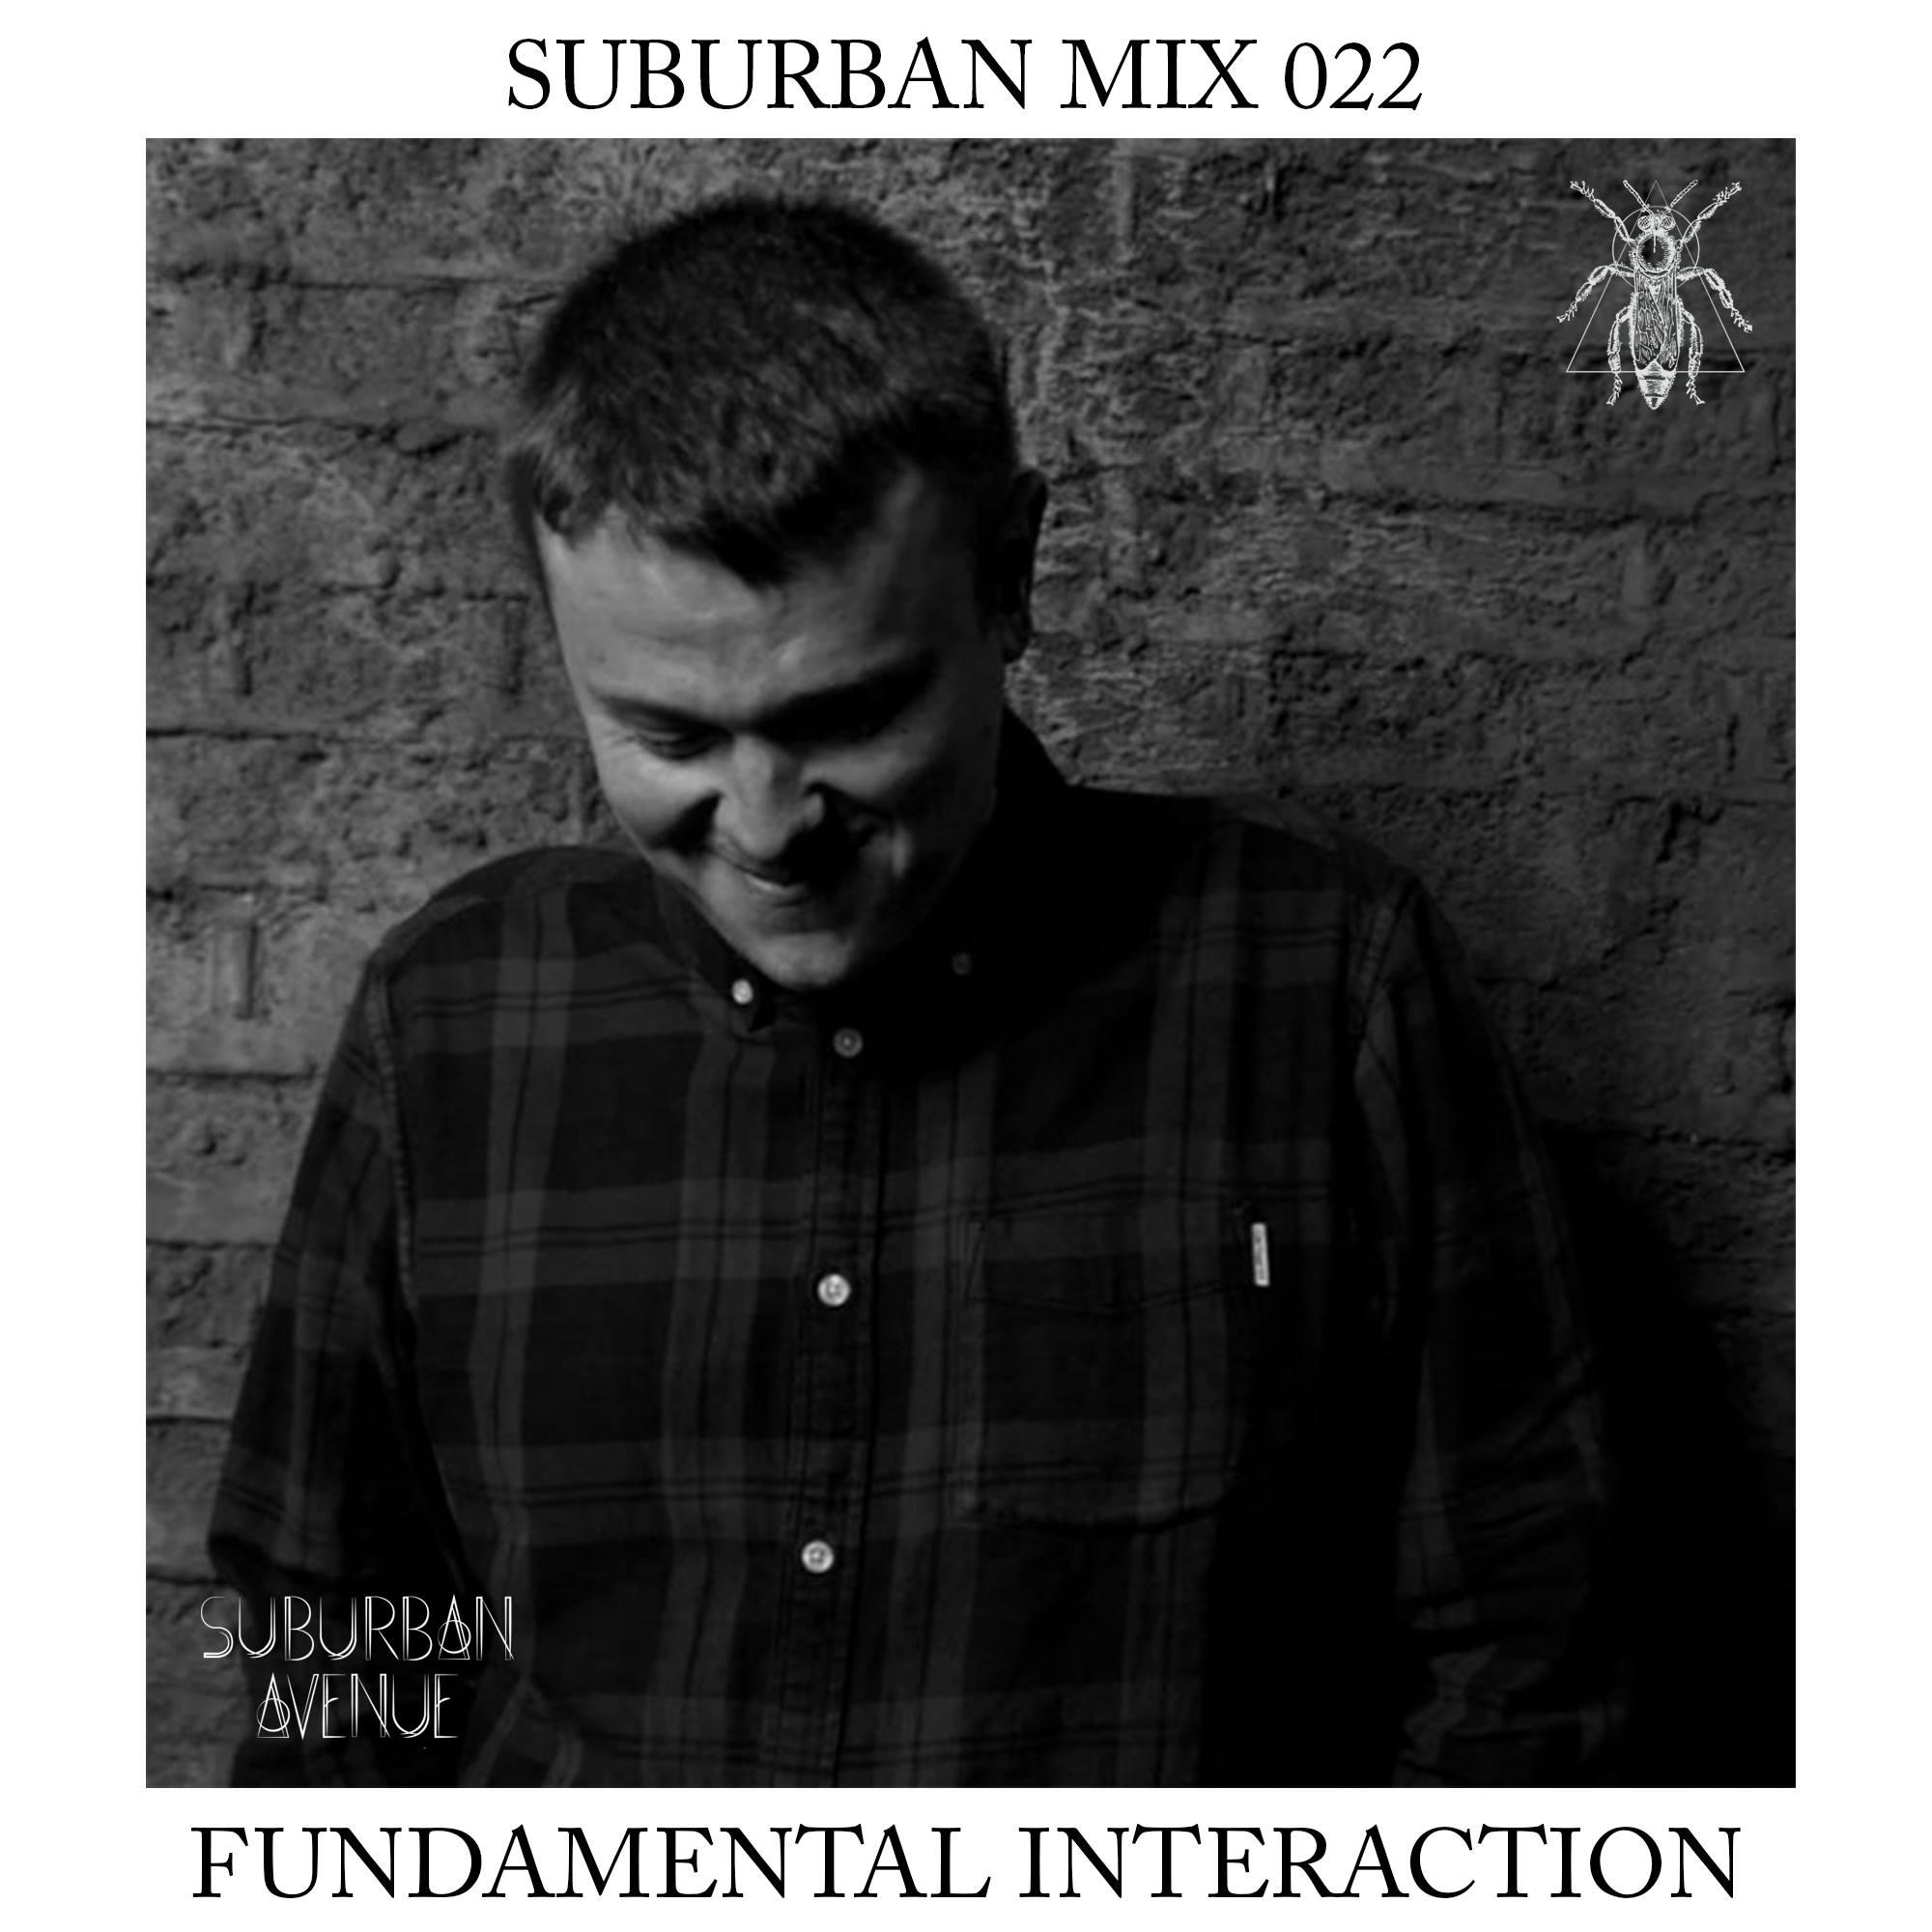 Suburban Mix 022 - Fundamental Interaction